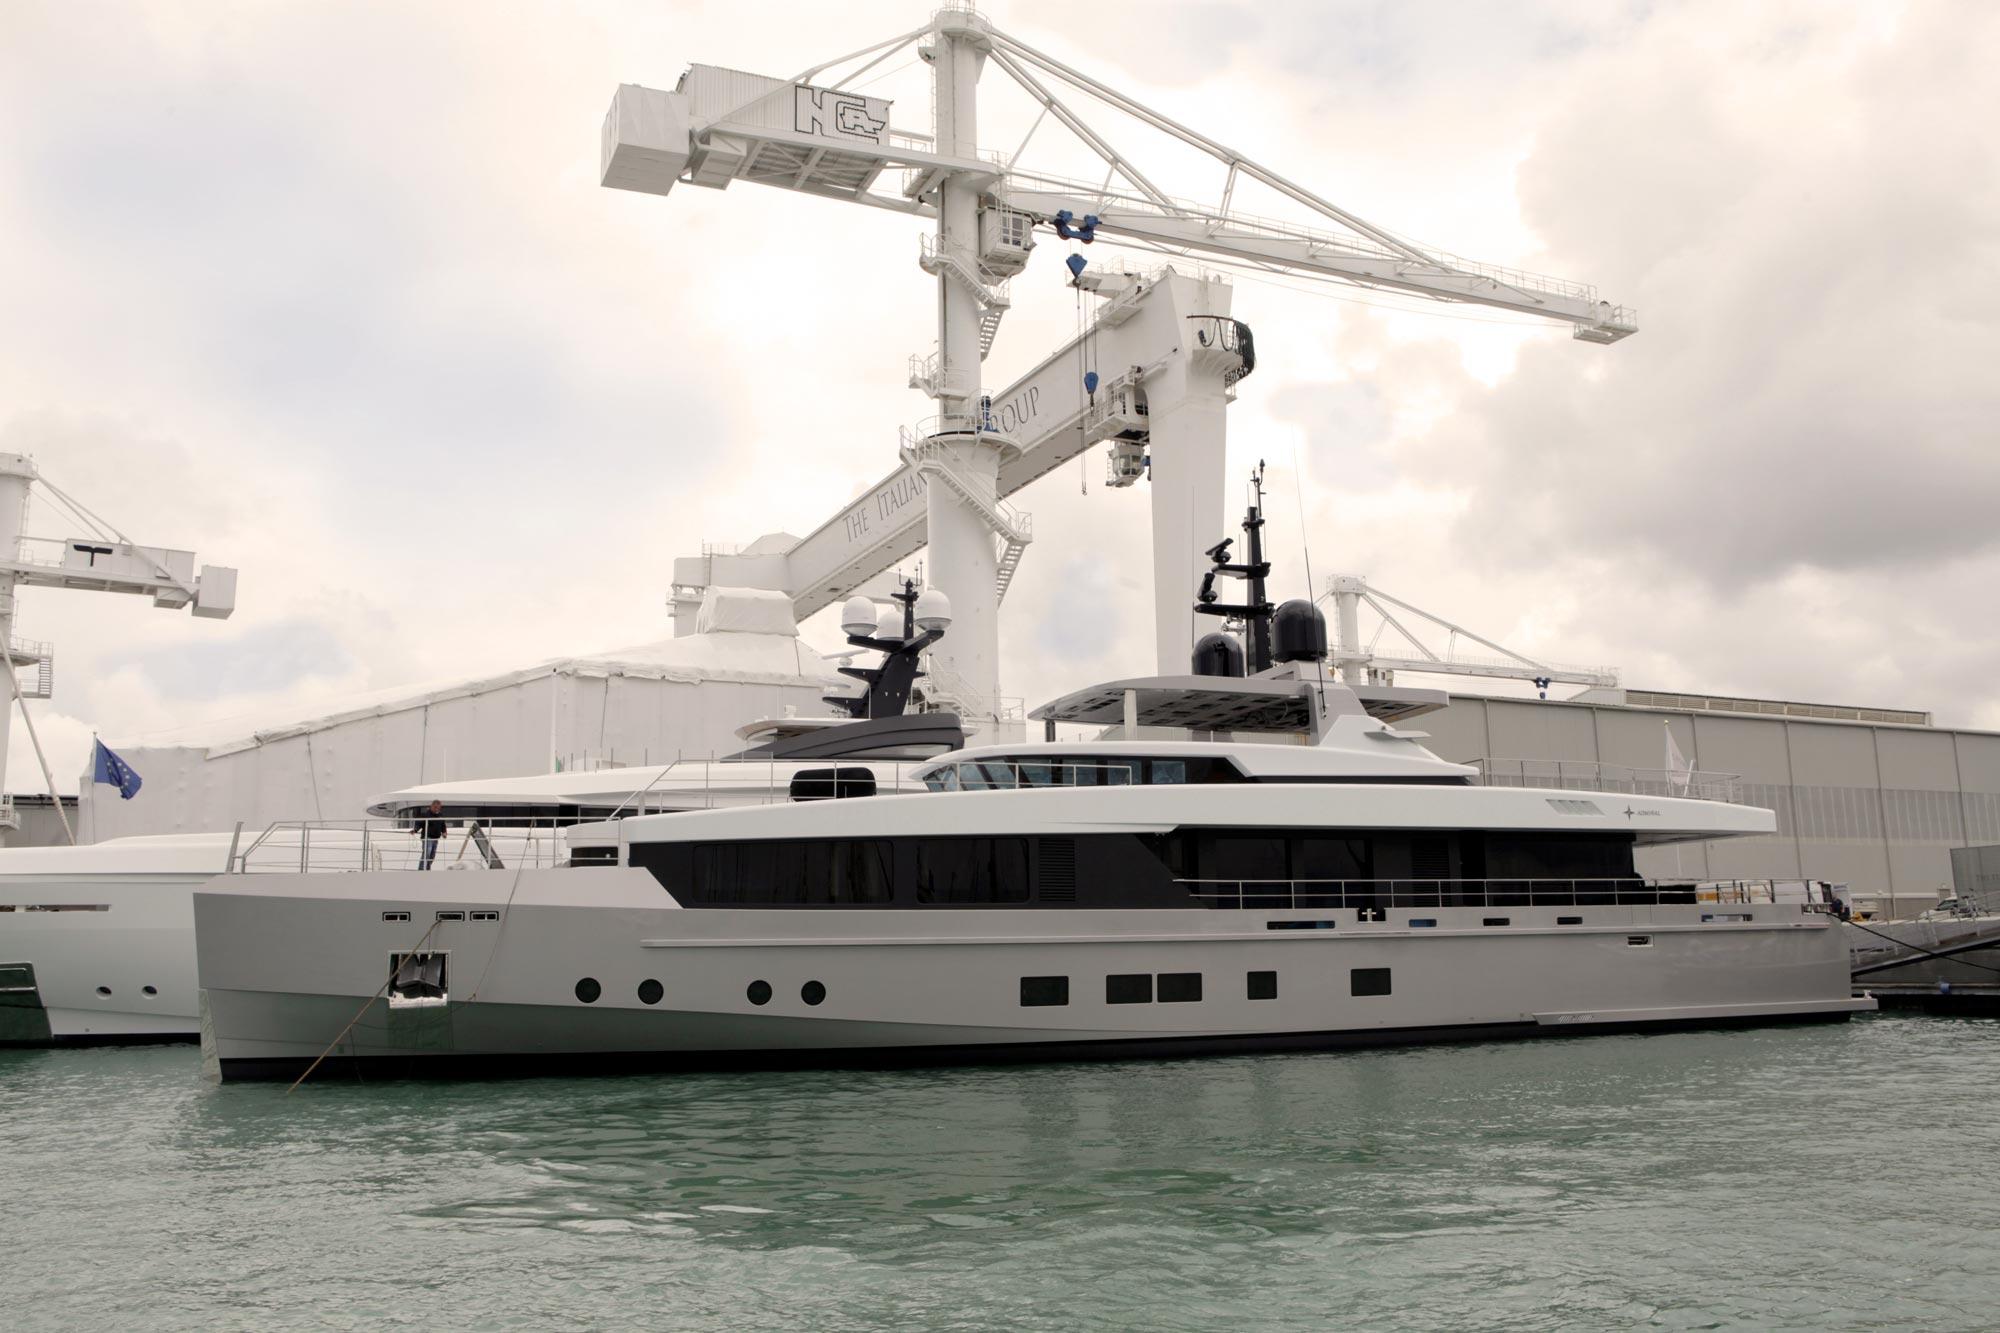 admiral yachts